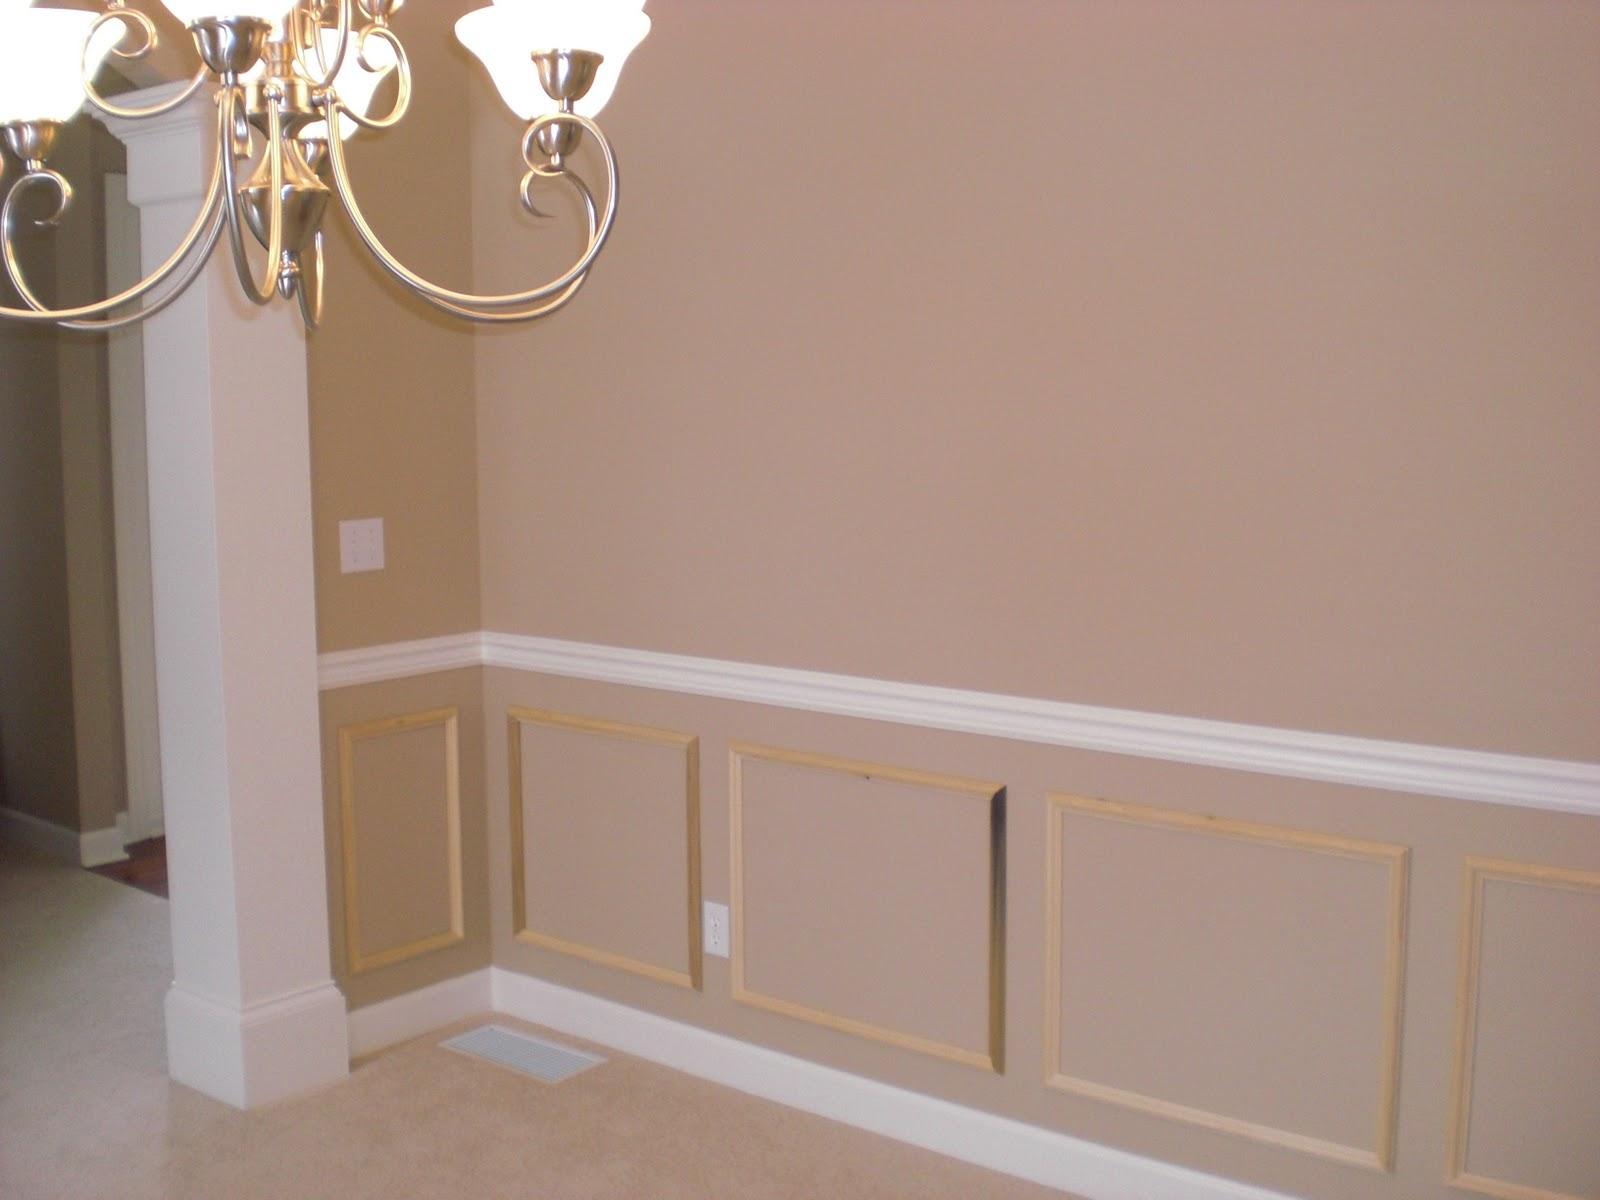 Wainscoting dining room wallpaper - Wallpaper Wainscoting Halv 8